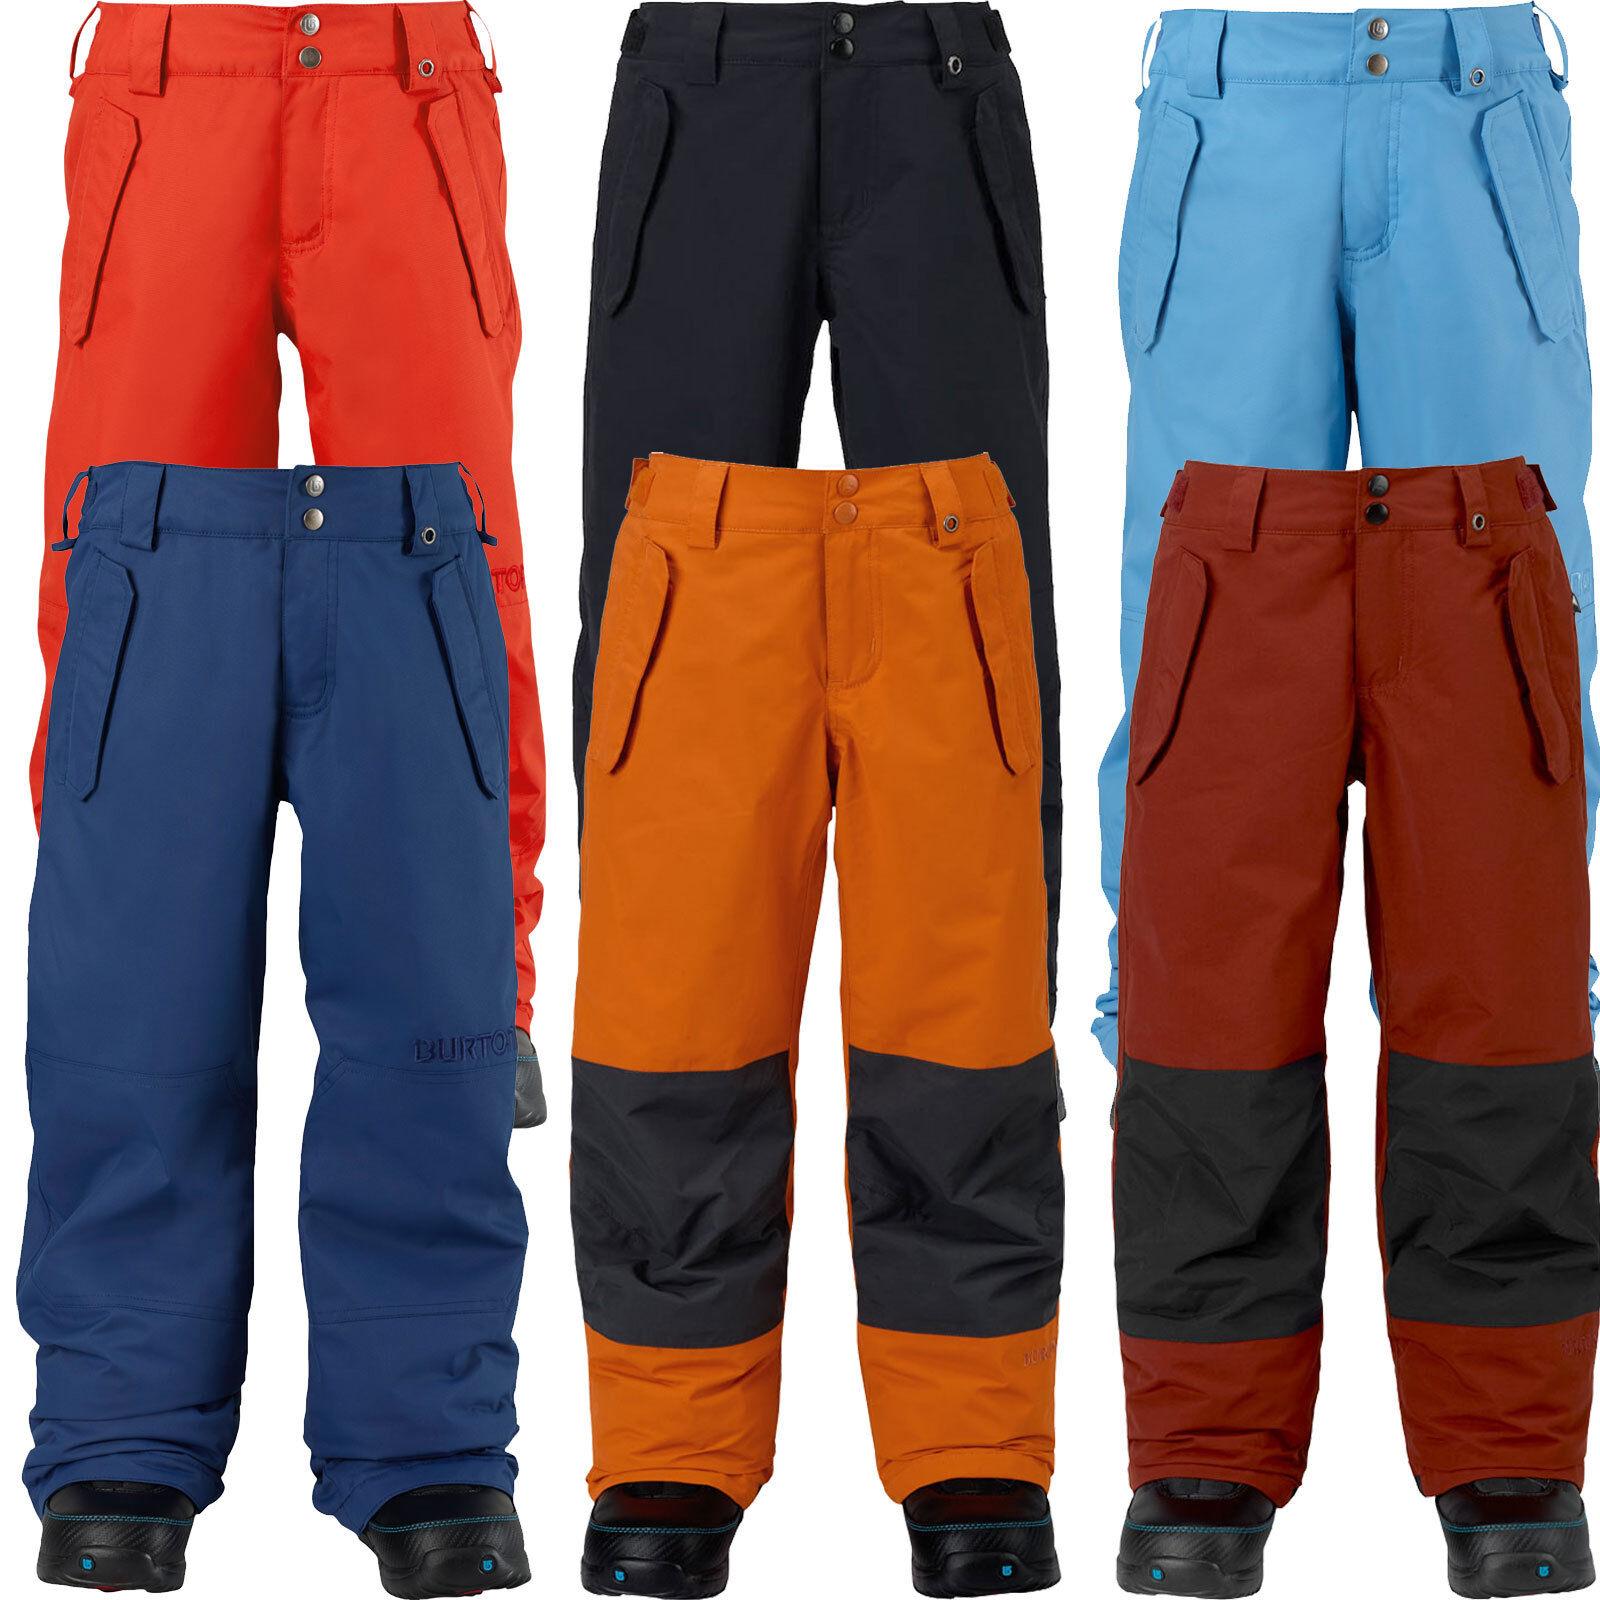 Burton Boys Parkway Snow Pant Kinder-Snowboardhose Skihose blue Schneehose NEU